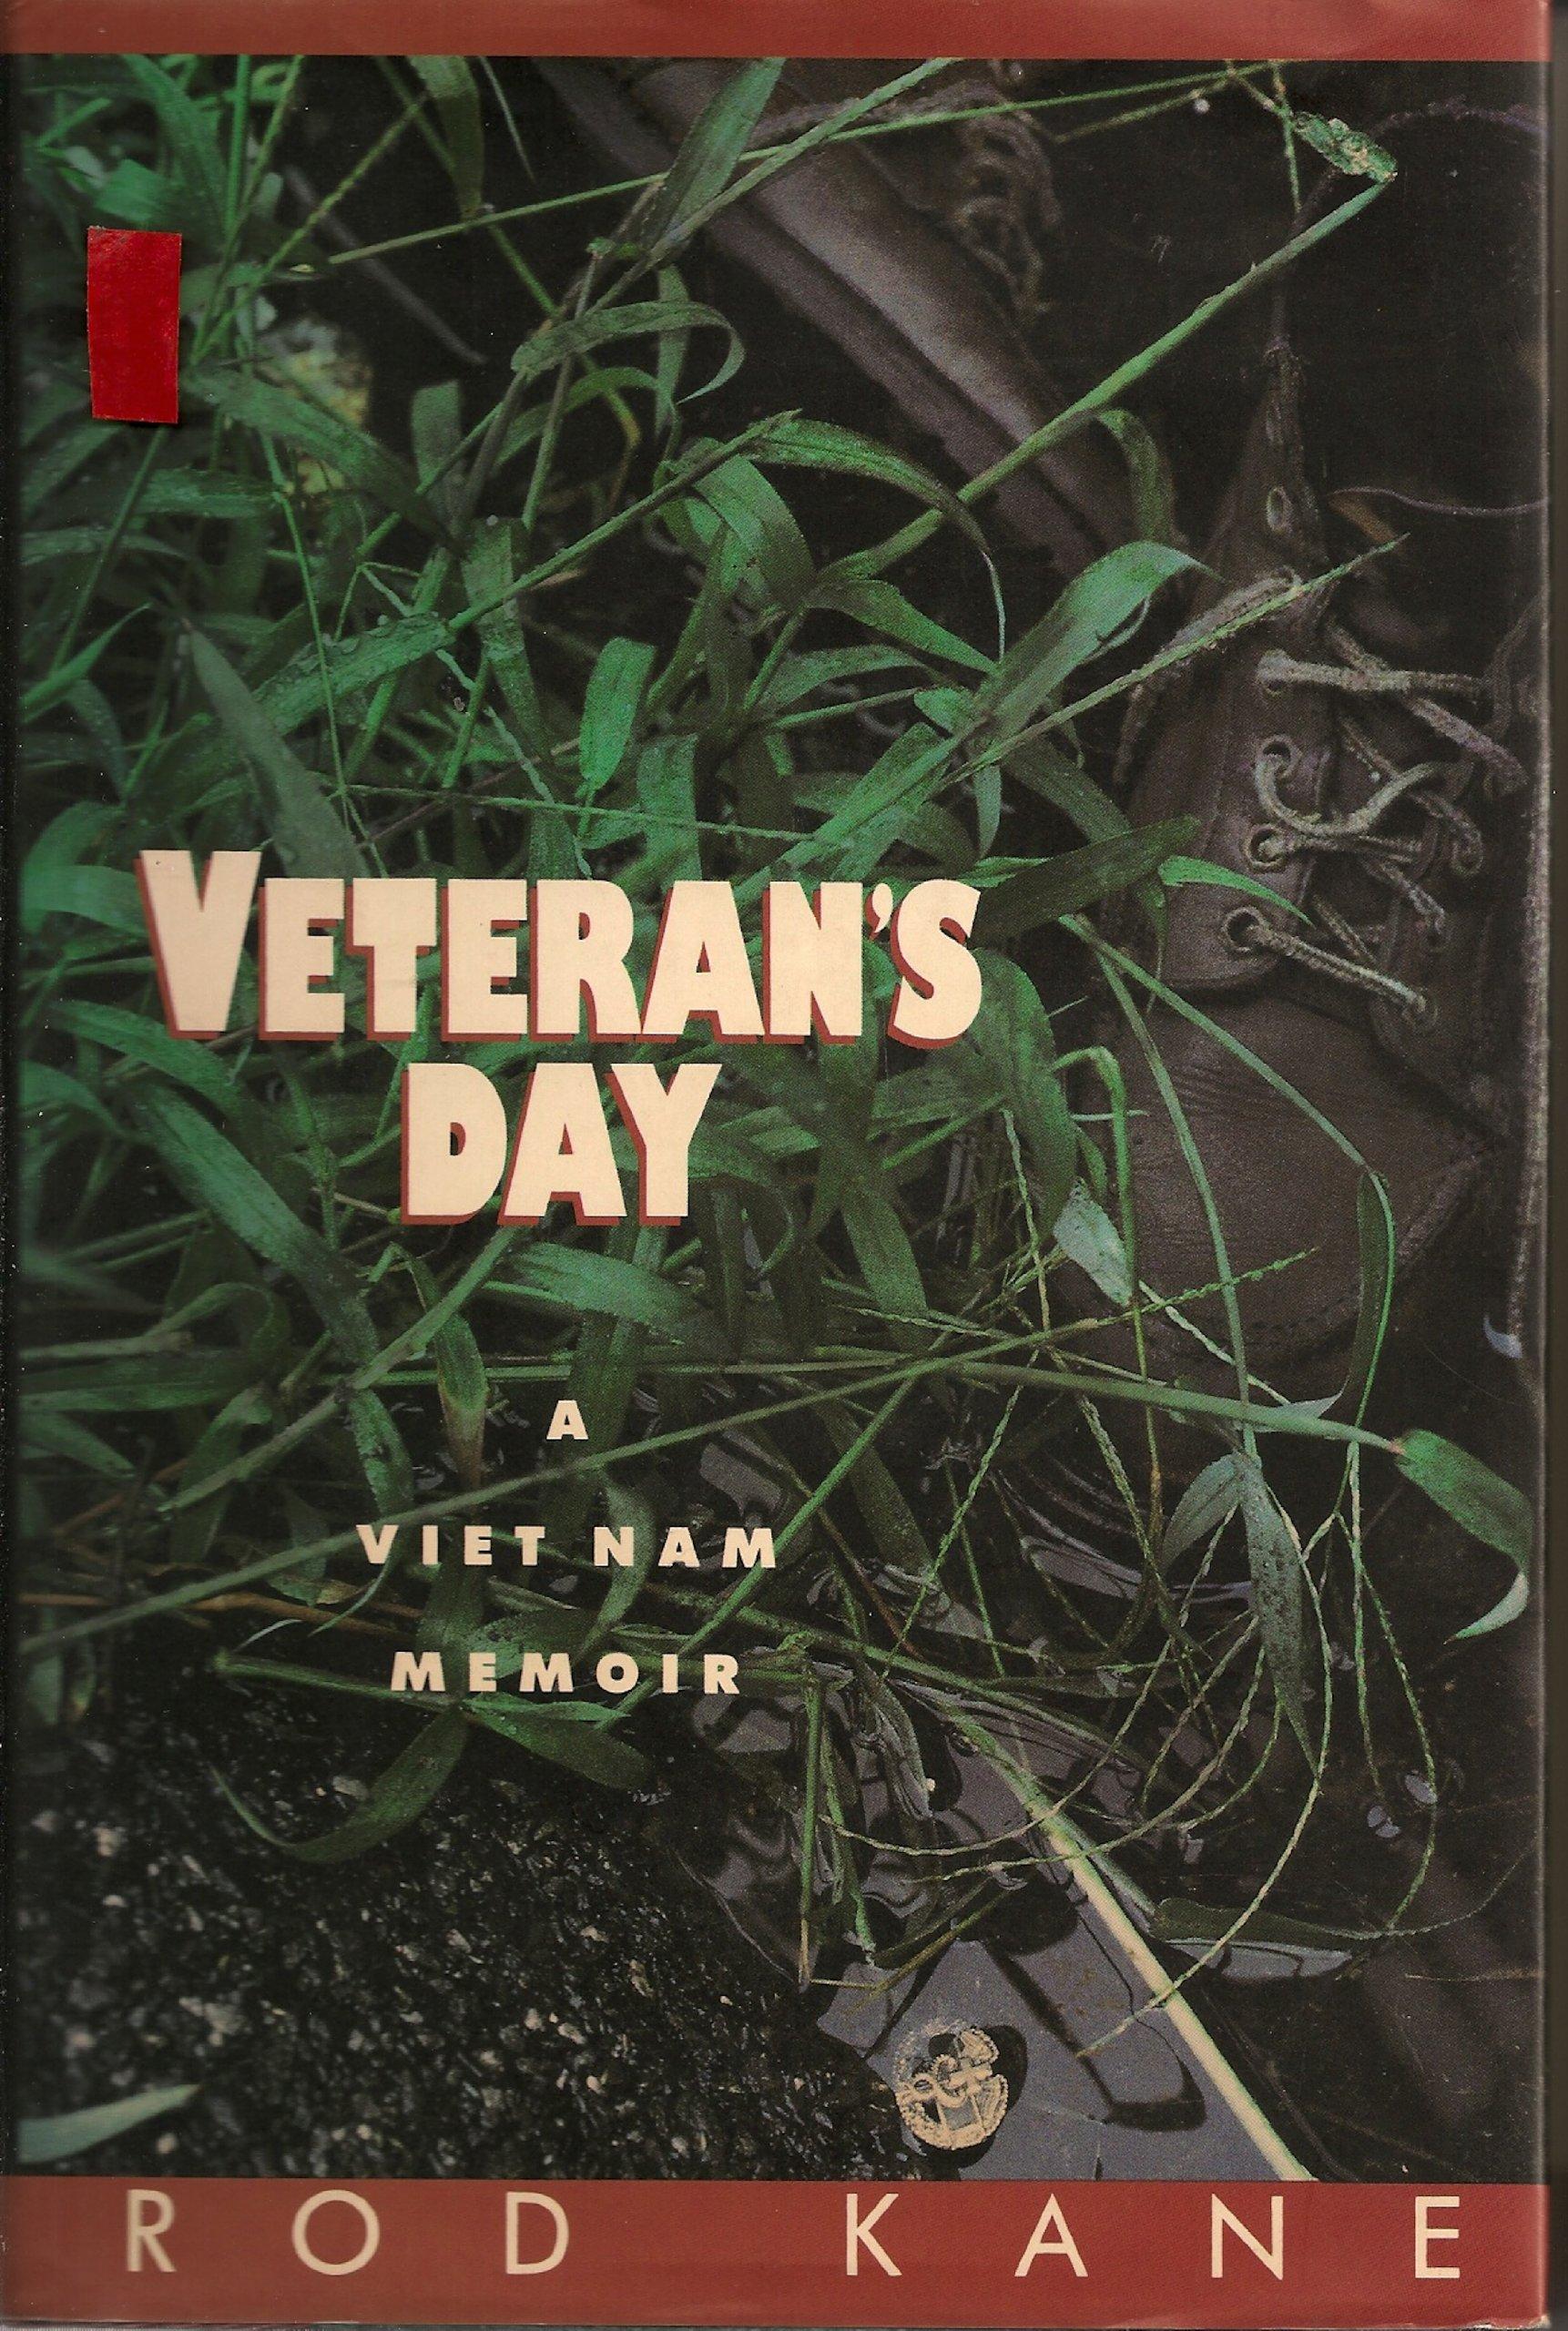 Veteran's Day: A Viet Nam Memoir: Rod Kane: 9780517569054: Amazon.com: Books